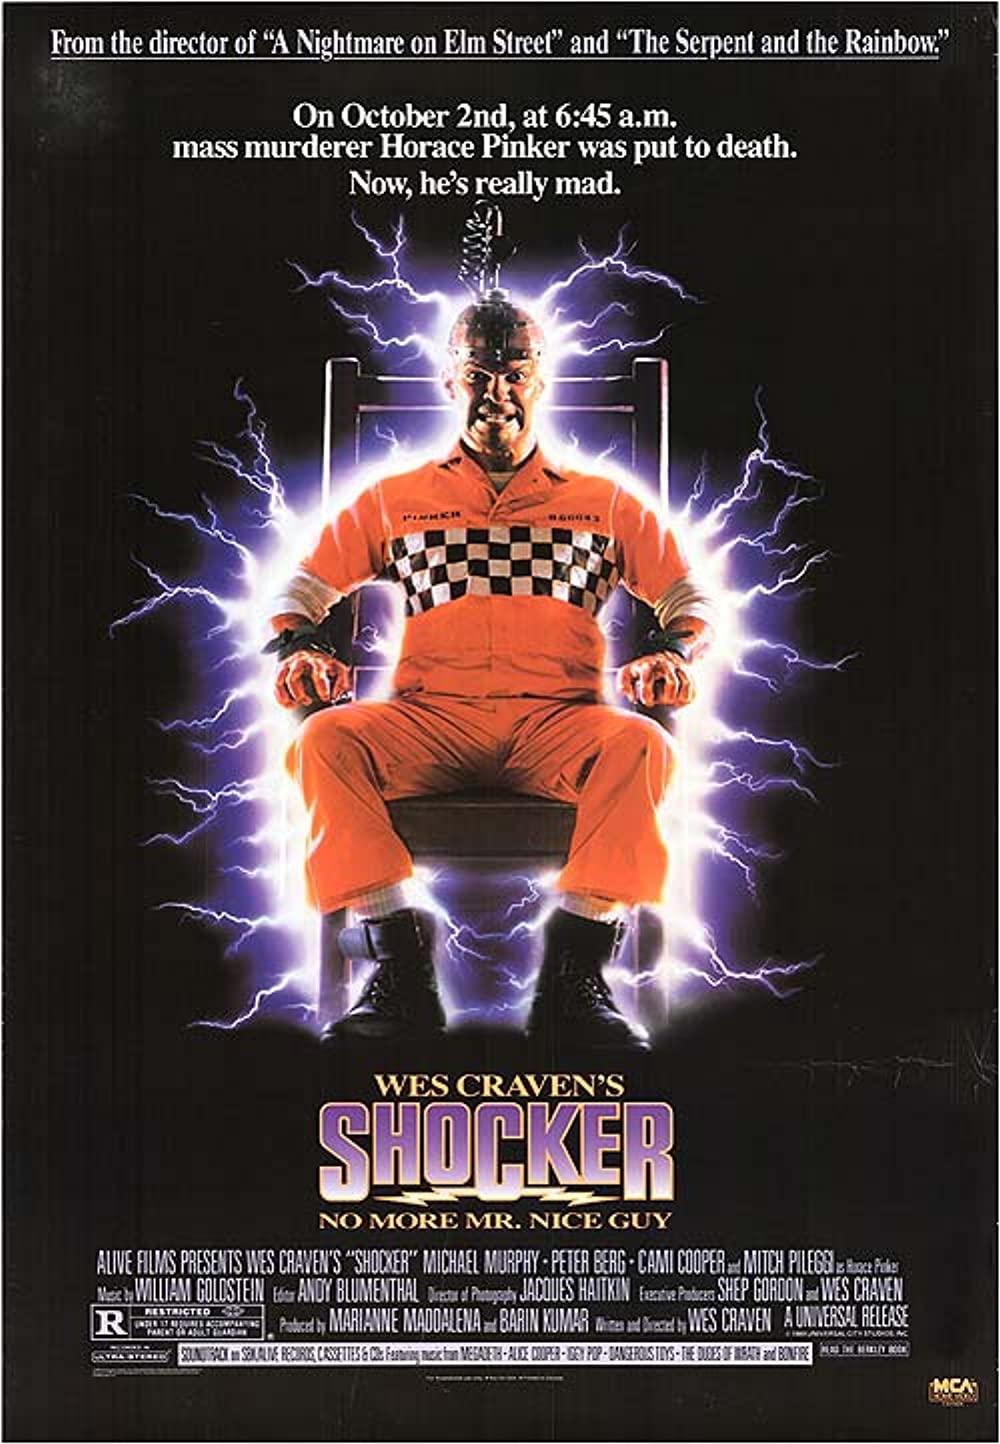 Shocker01